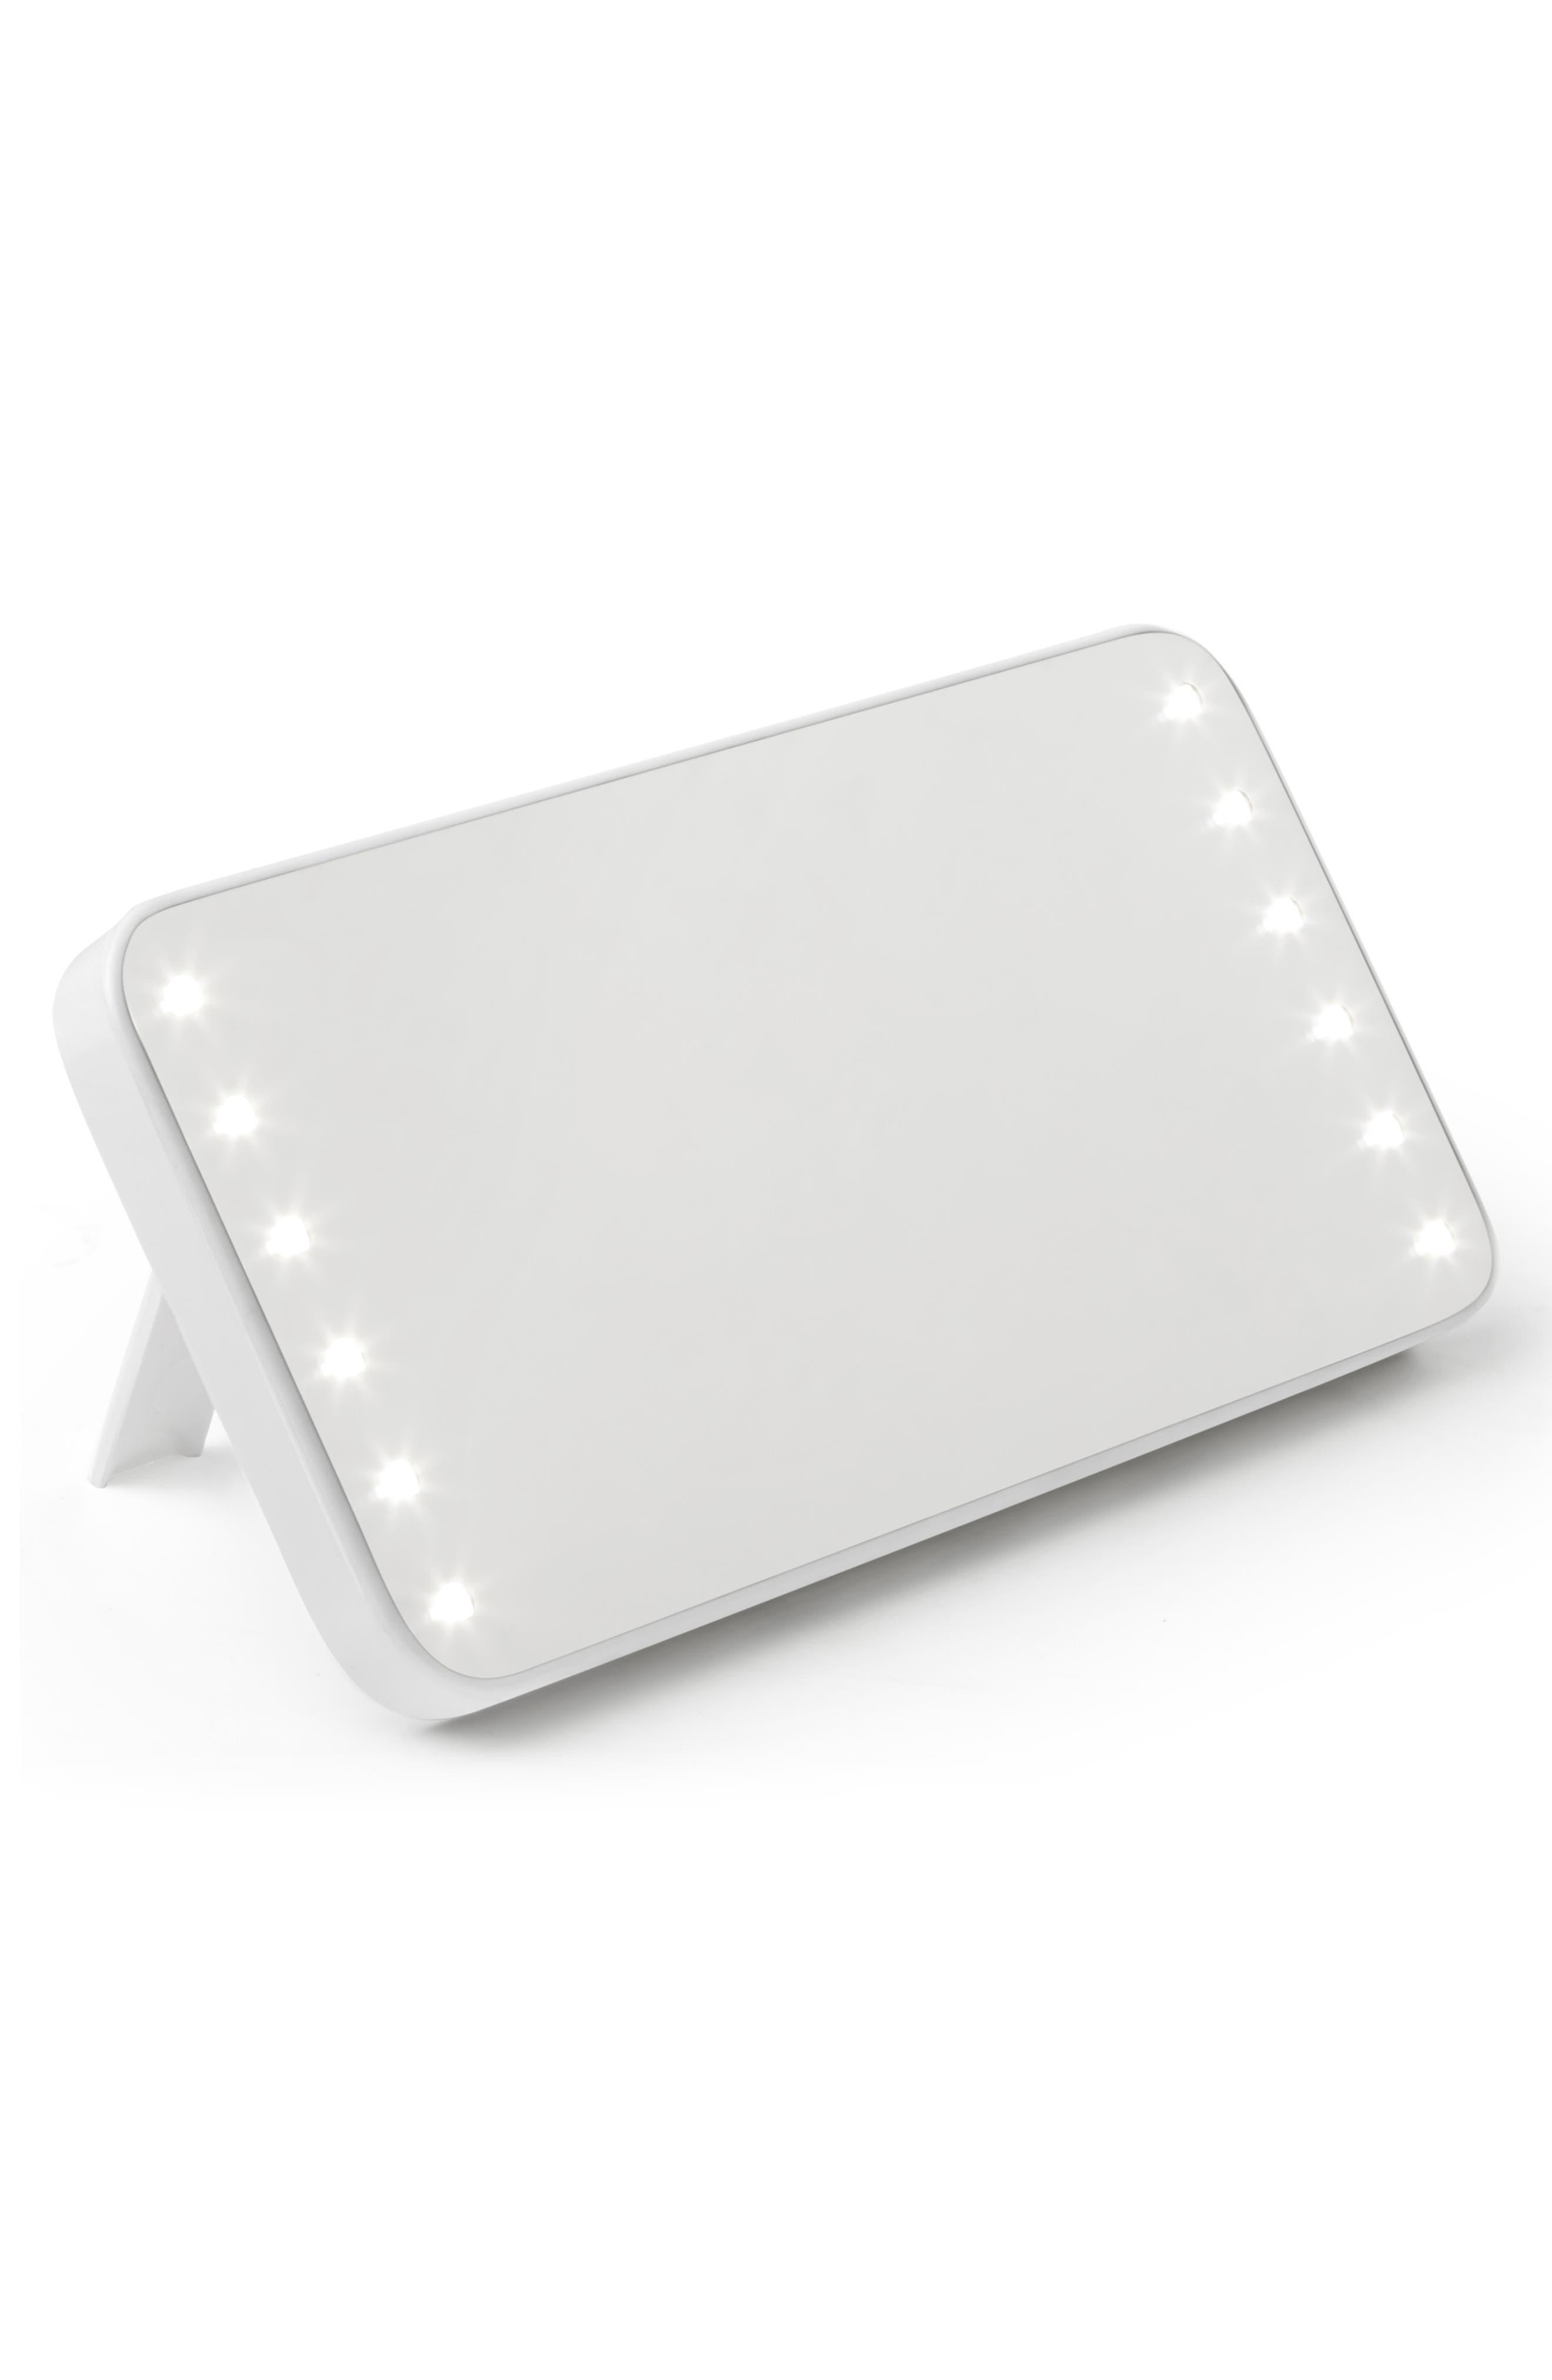 Cutie Portable Lighted Mirror,                             Alternate thumbnail 3, color,                             NO COLOR